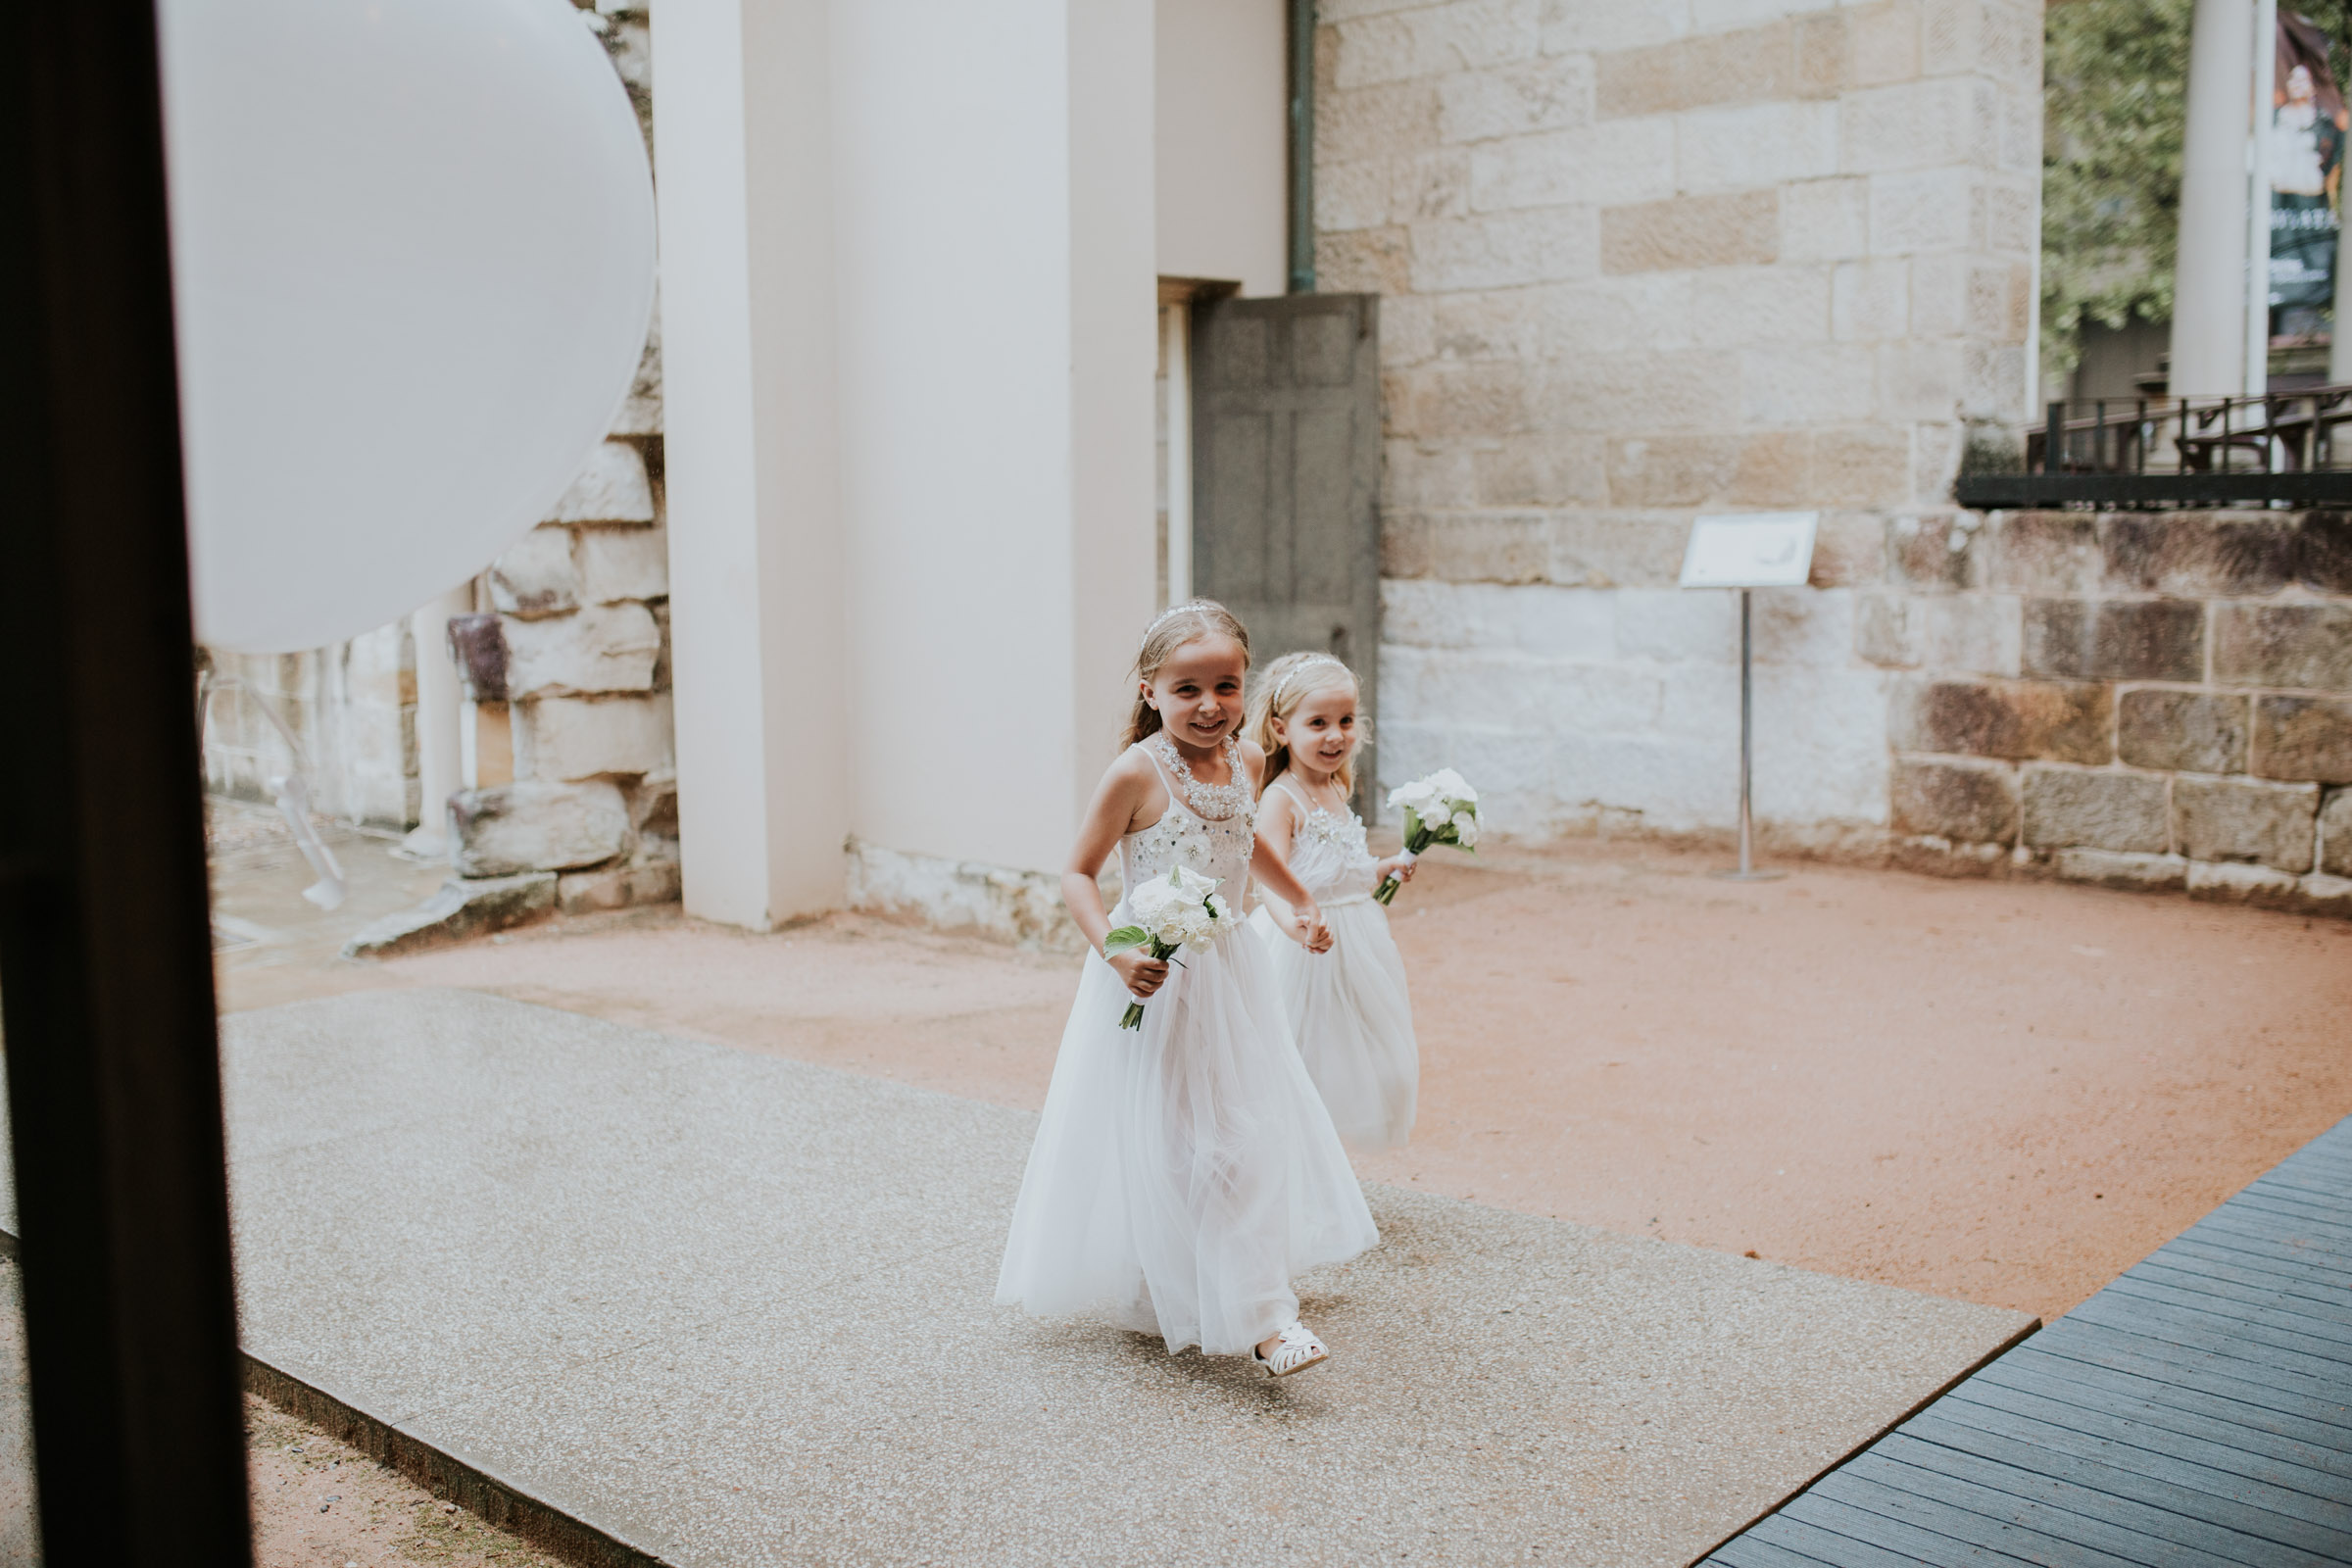 Nicola+Dee-Sydney Mint Wedding-49.jpg